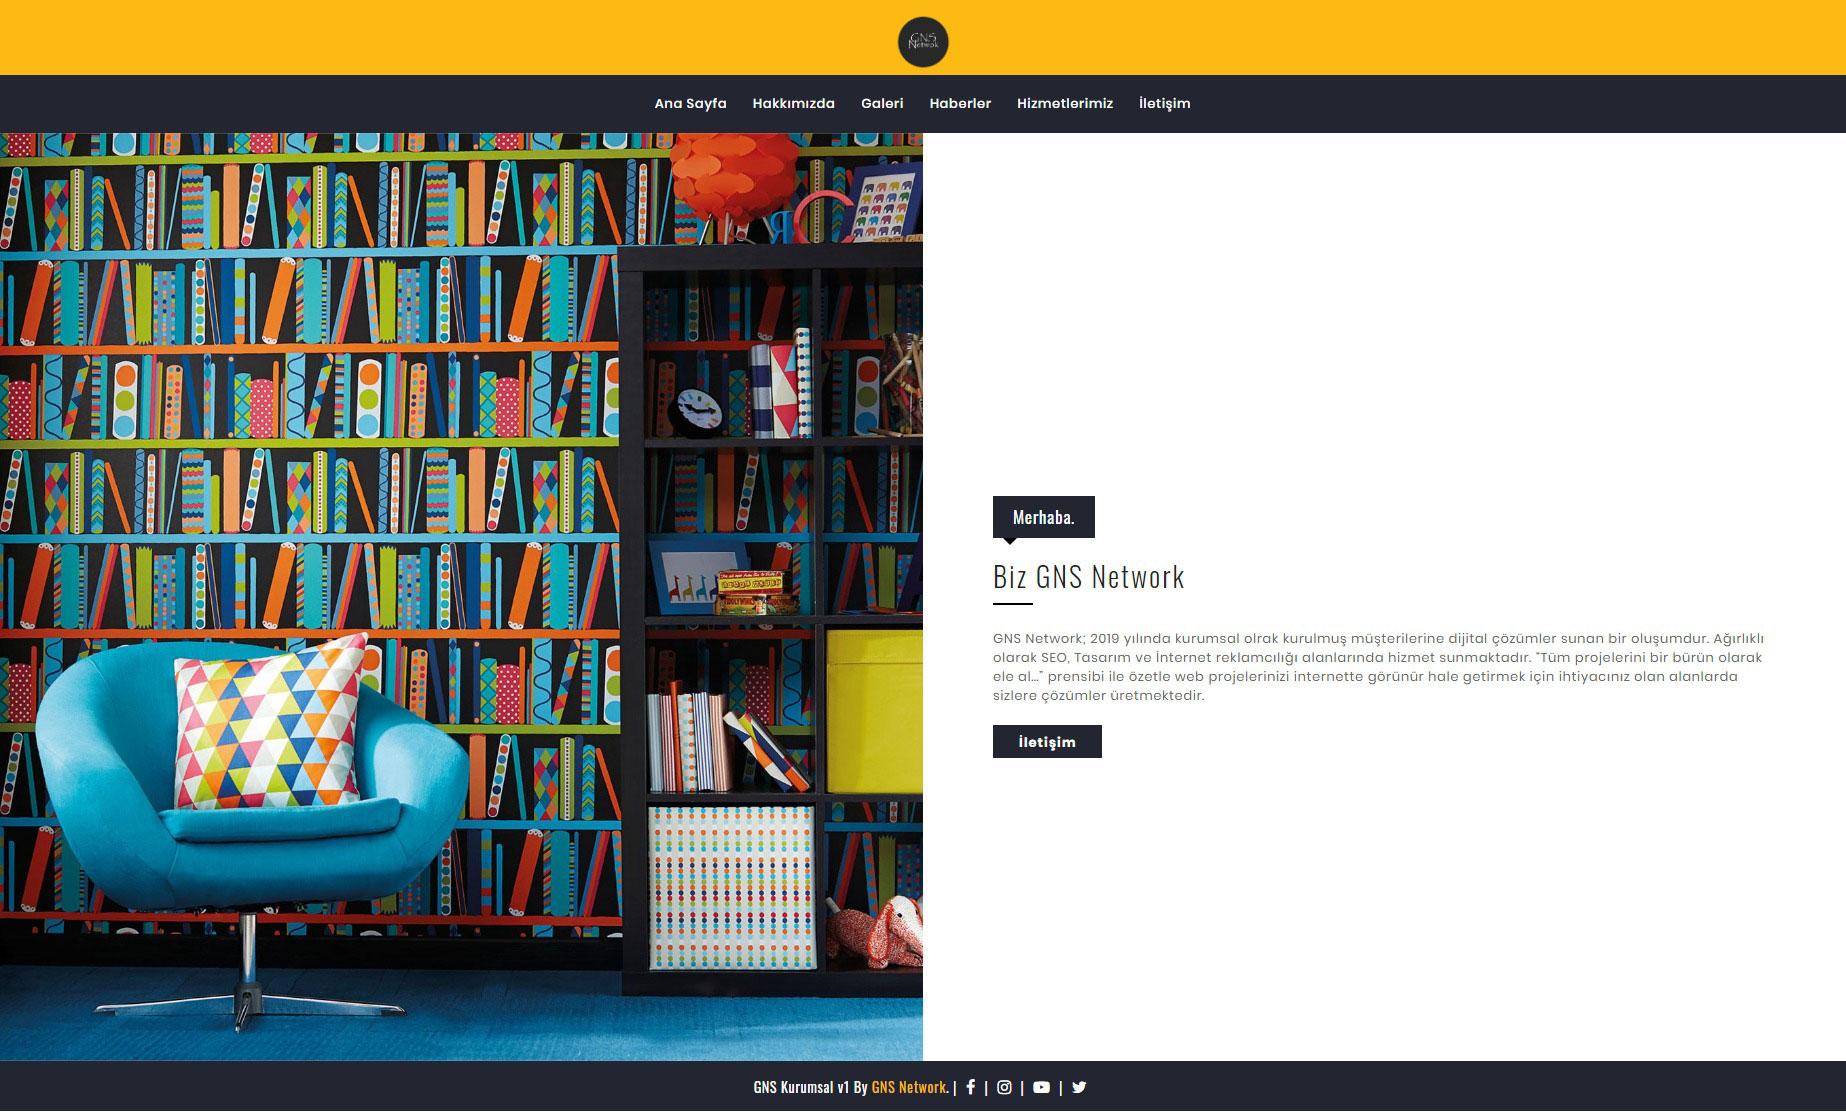 GNS Tam Sayfa Site - Kurumsal Firma Scripti Bilgisayarda 2